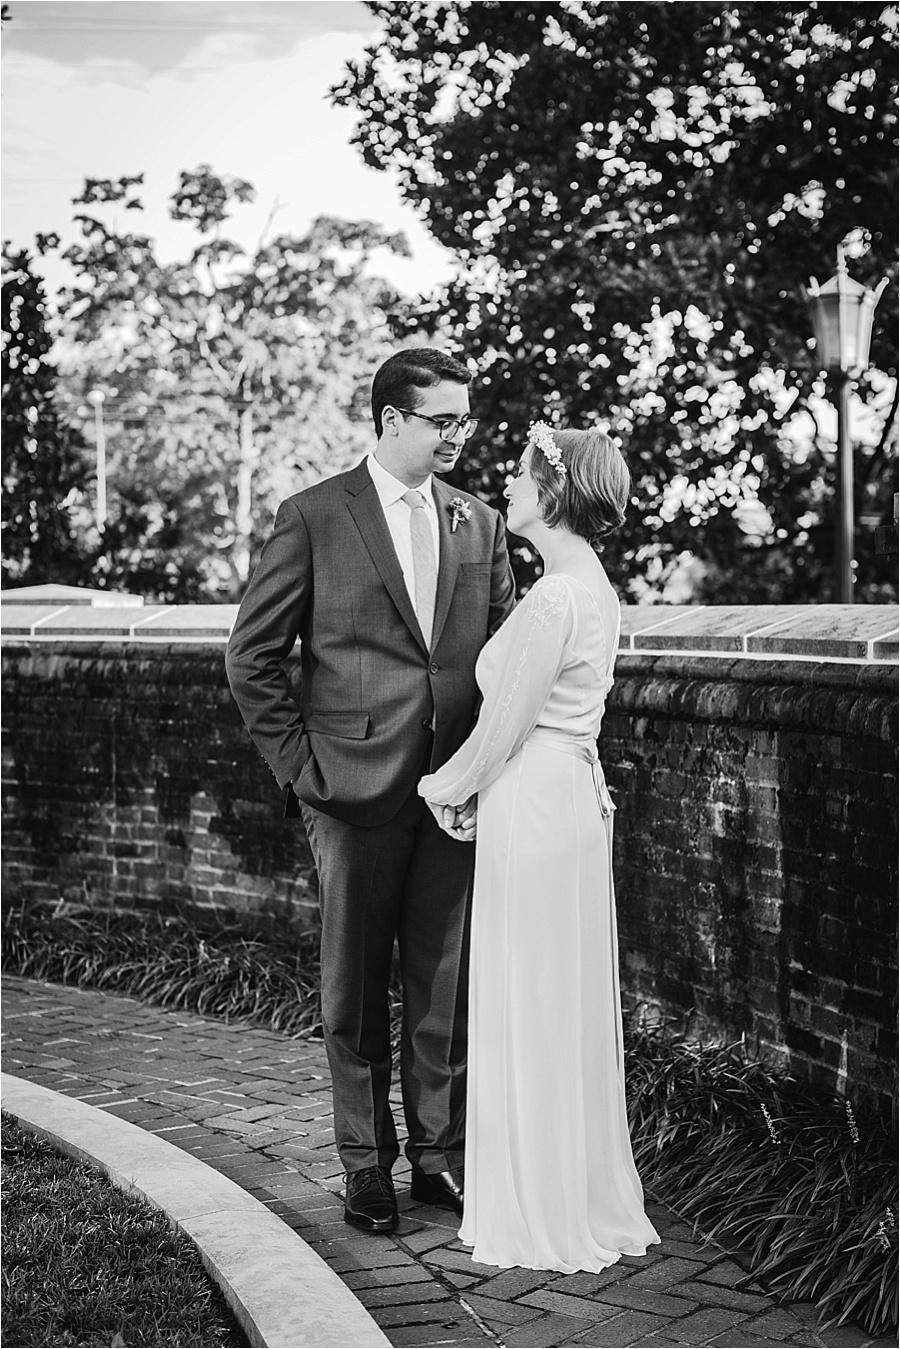 CK-Photo-Nashville-Wedding-Photographer-b_0090.jpg